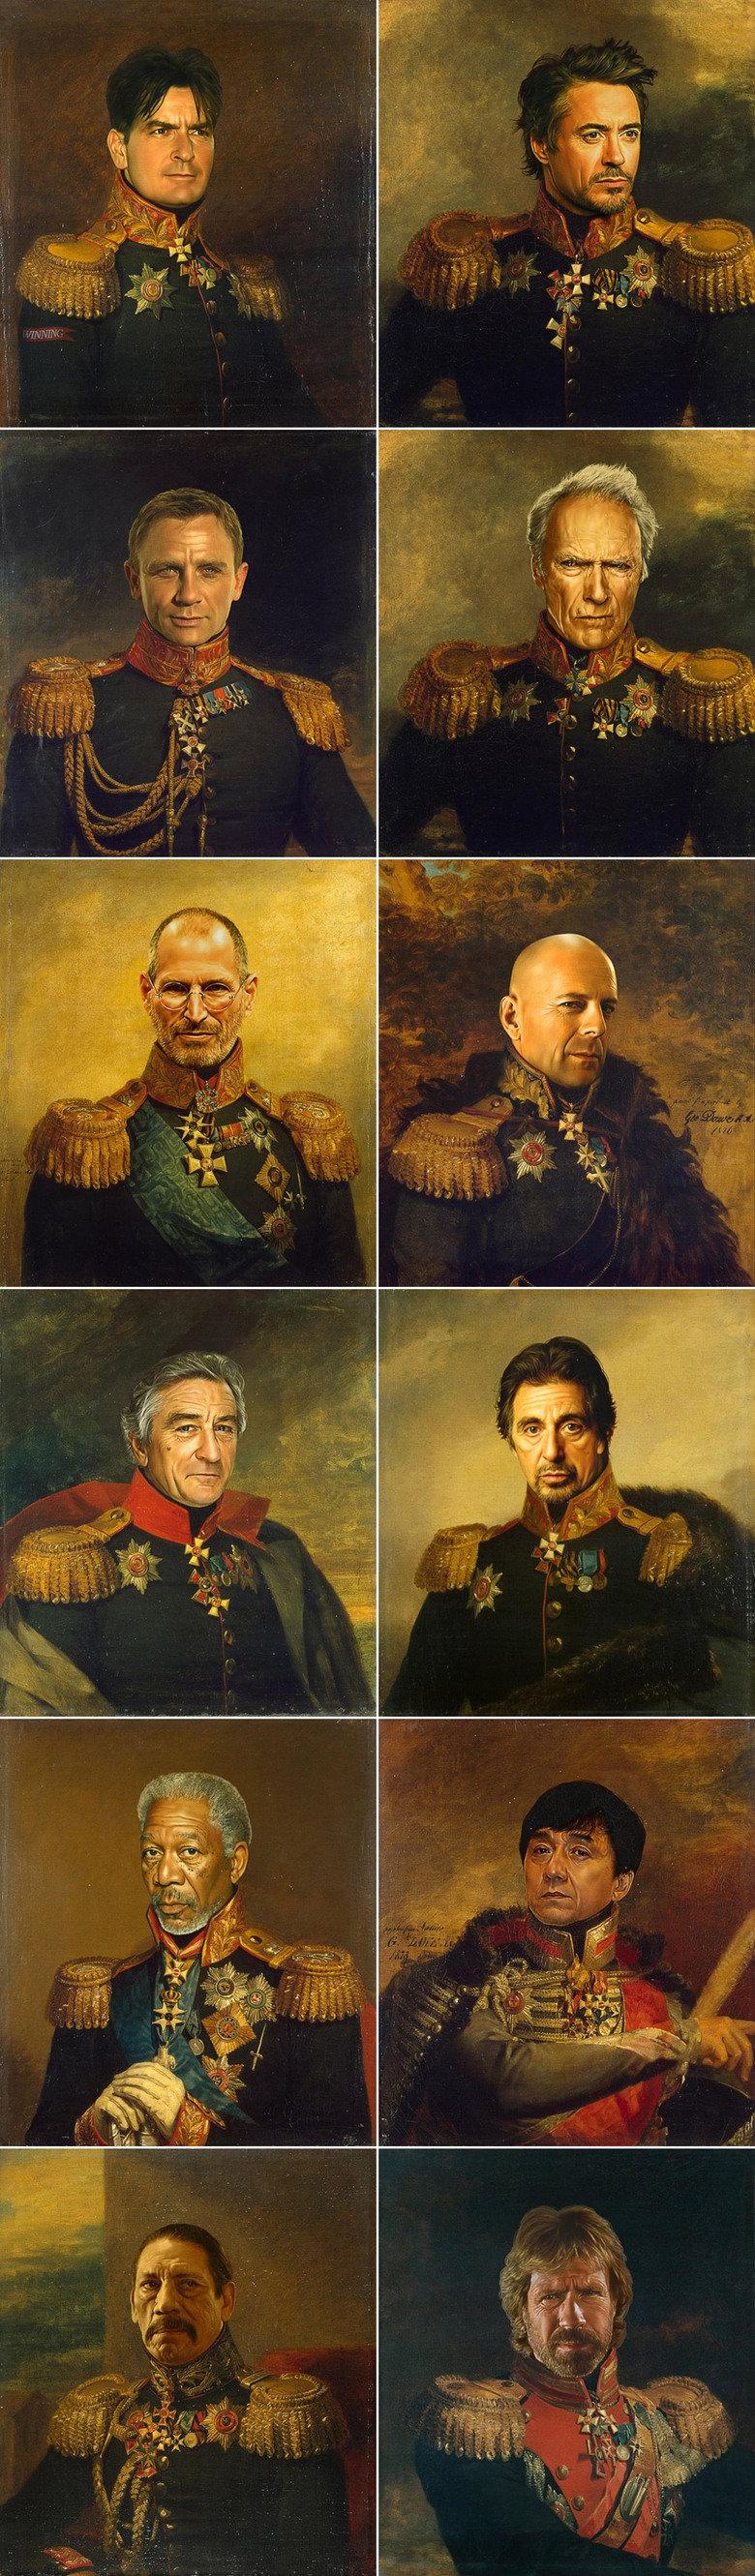 The best Generals ever!. Photoshop art project: celebrities replacing Russian generals.. jobs is a faggot loljk, he WAS a faggot, but then he died XD